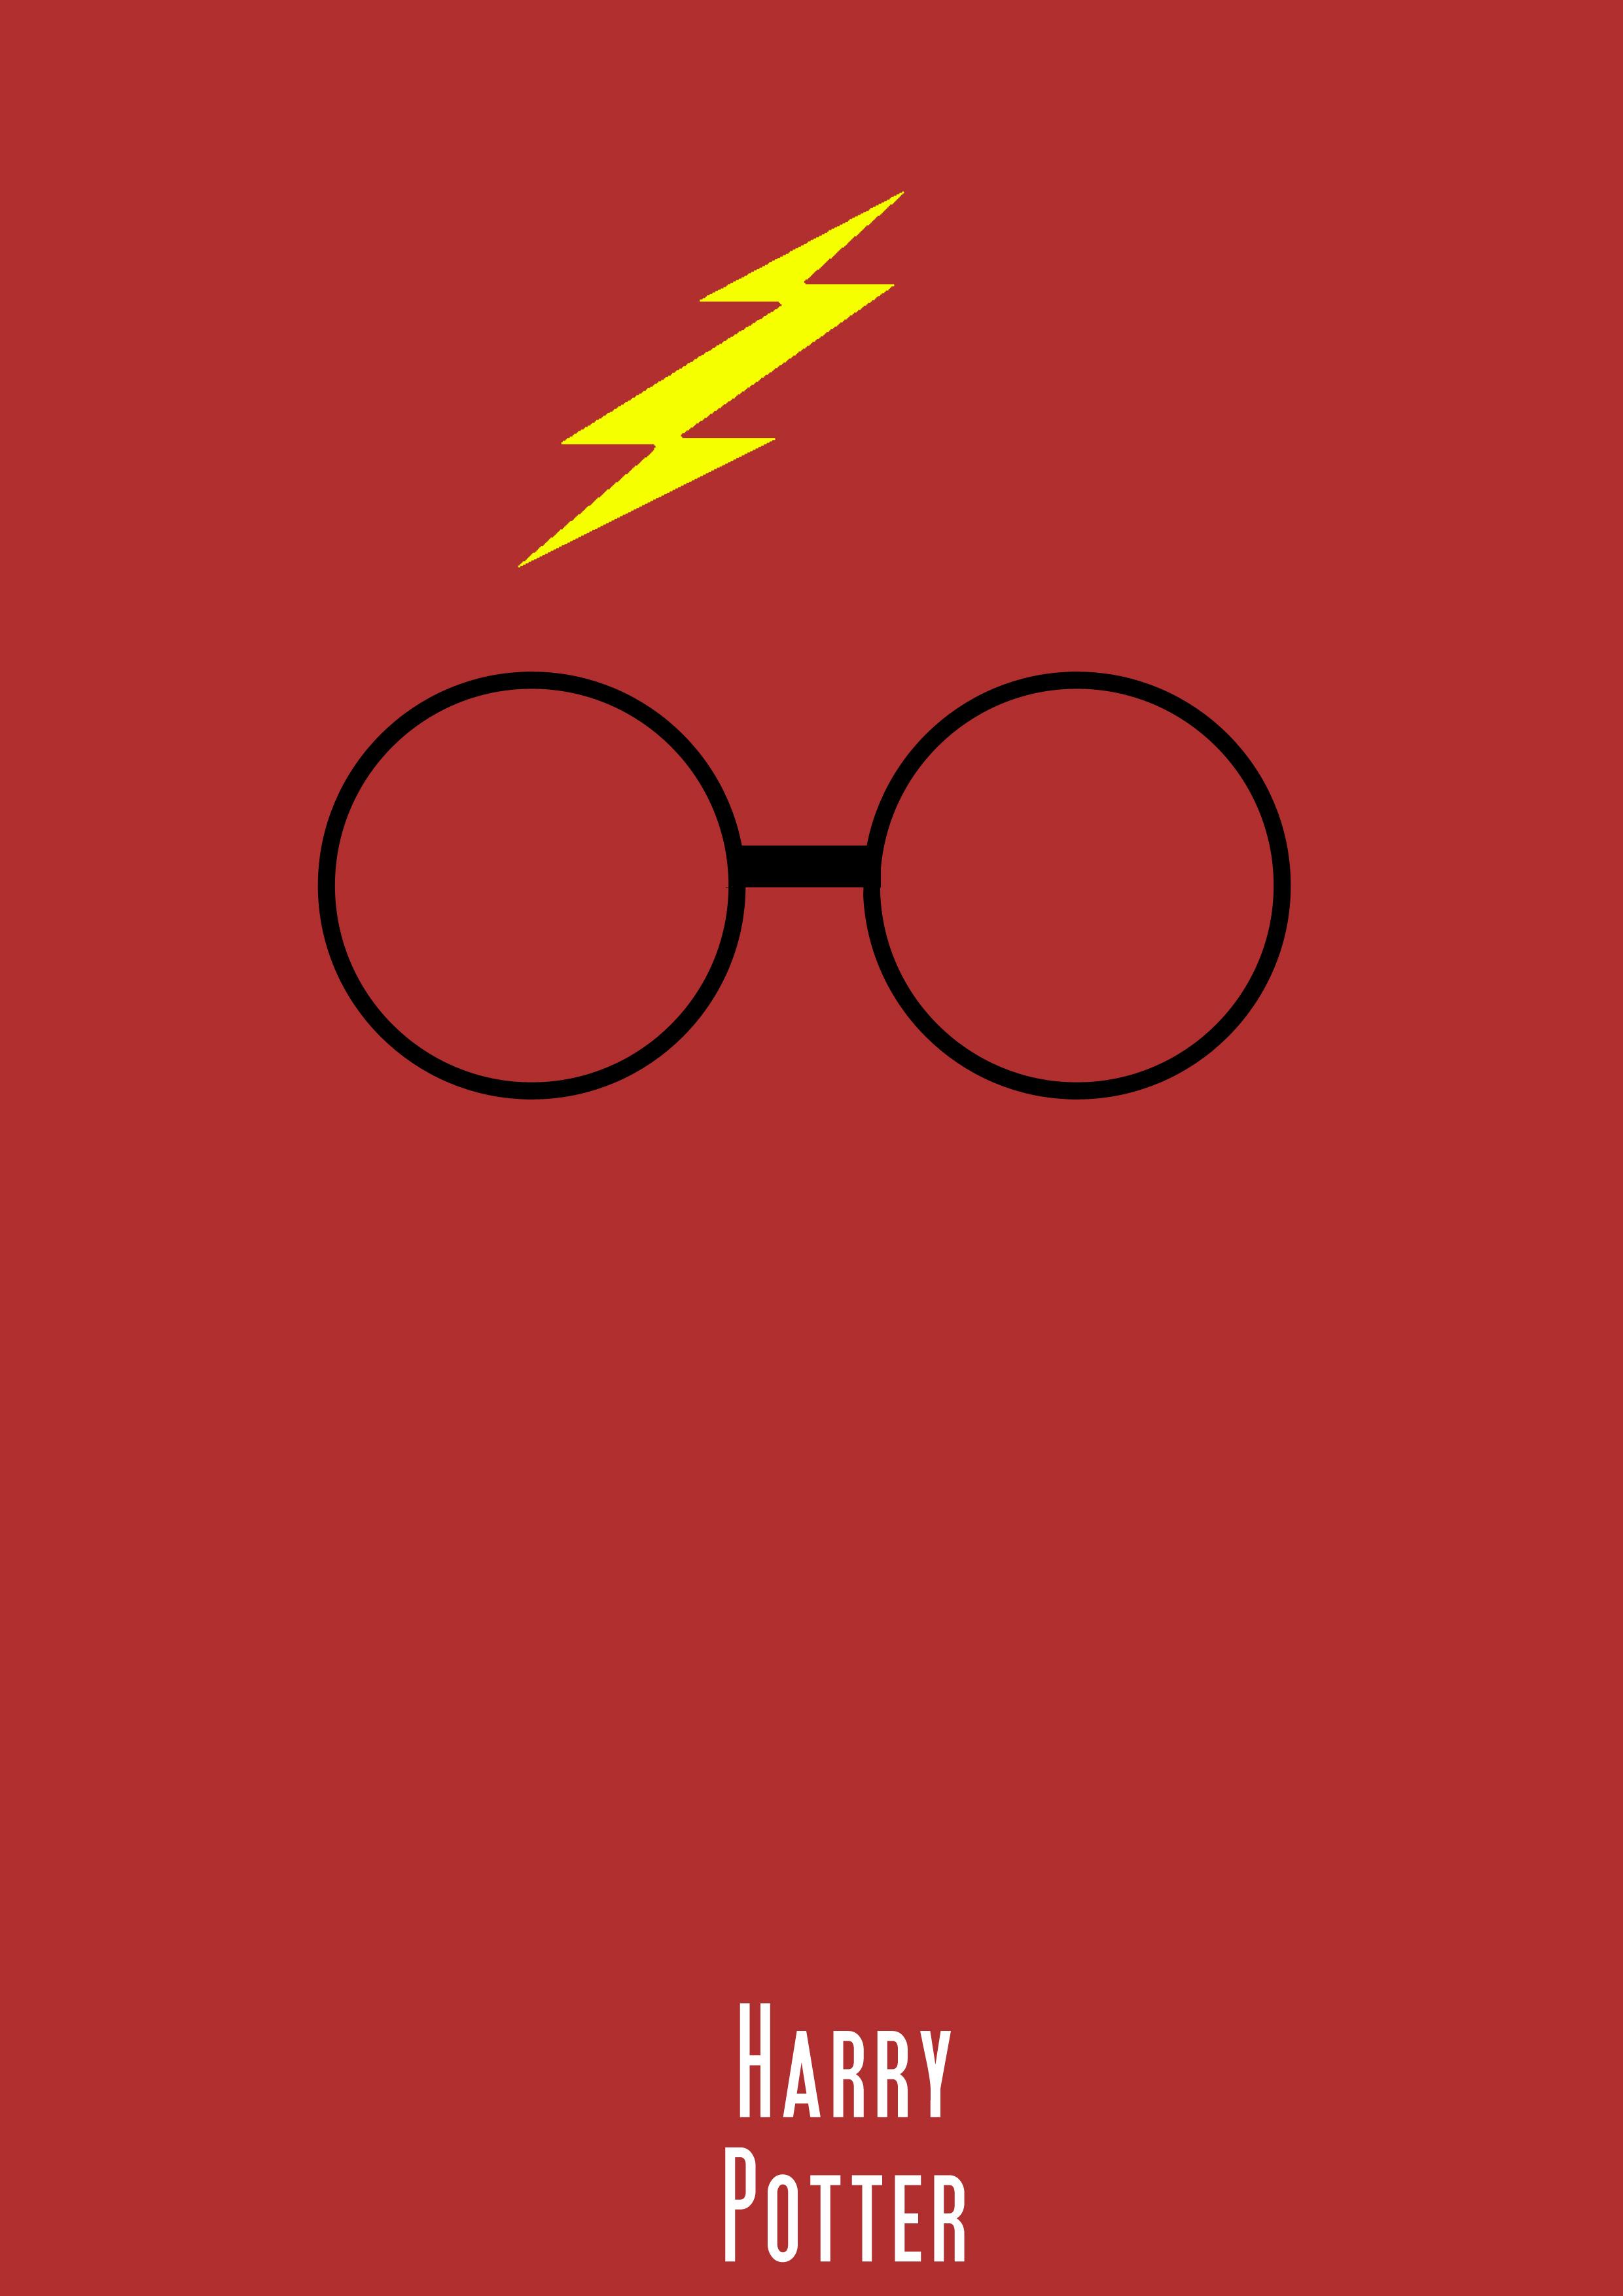 Best Wallpaper Harry Potter Minimalistic - minimal_harru_potter_poster_by_jackbauer89-d3e5310  Perfect Image Reference_508354.jpg